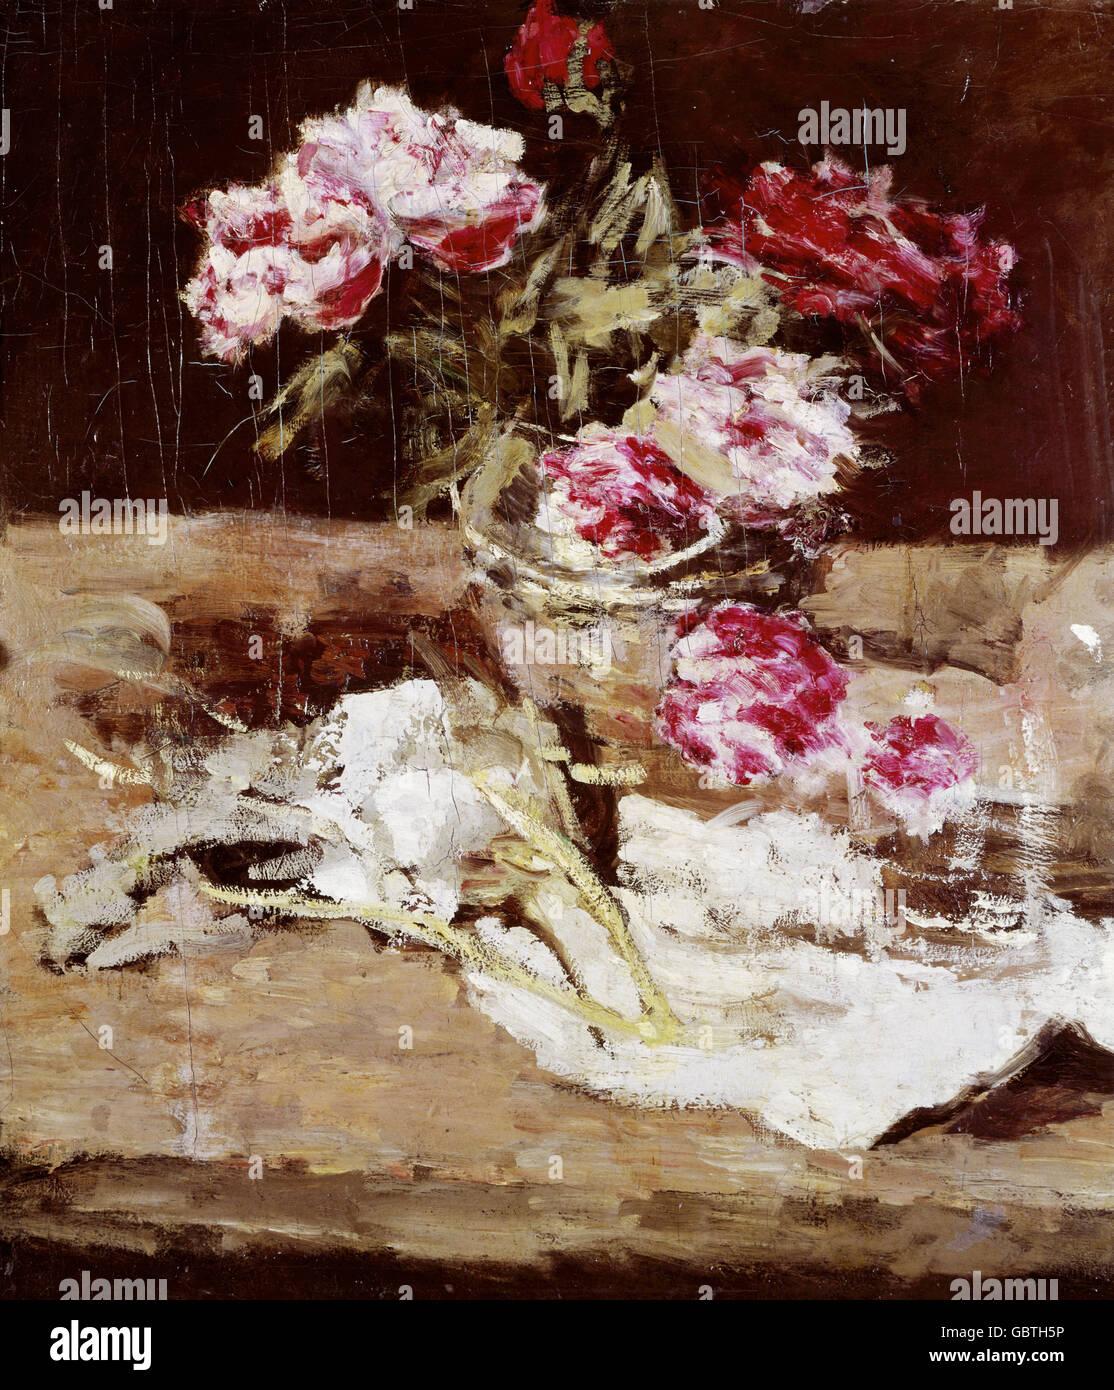 fine arts, Schuch, Karl (1846 - 1903), painting, 'Peonies', oil on canvas, circa 1885, Neue Pinakothek, - Stock Image